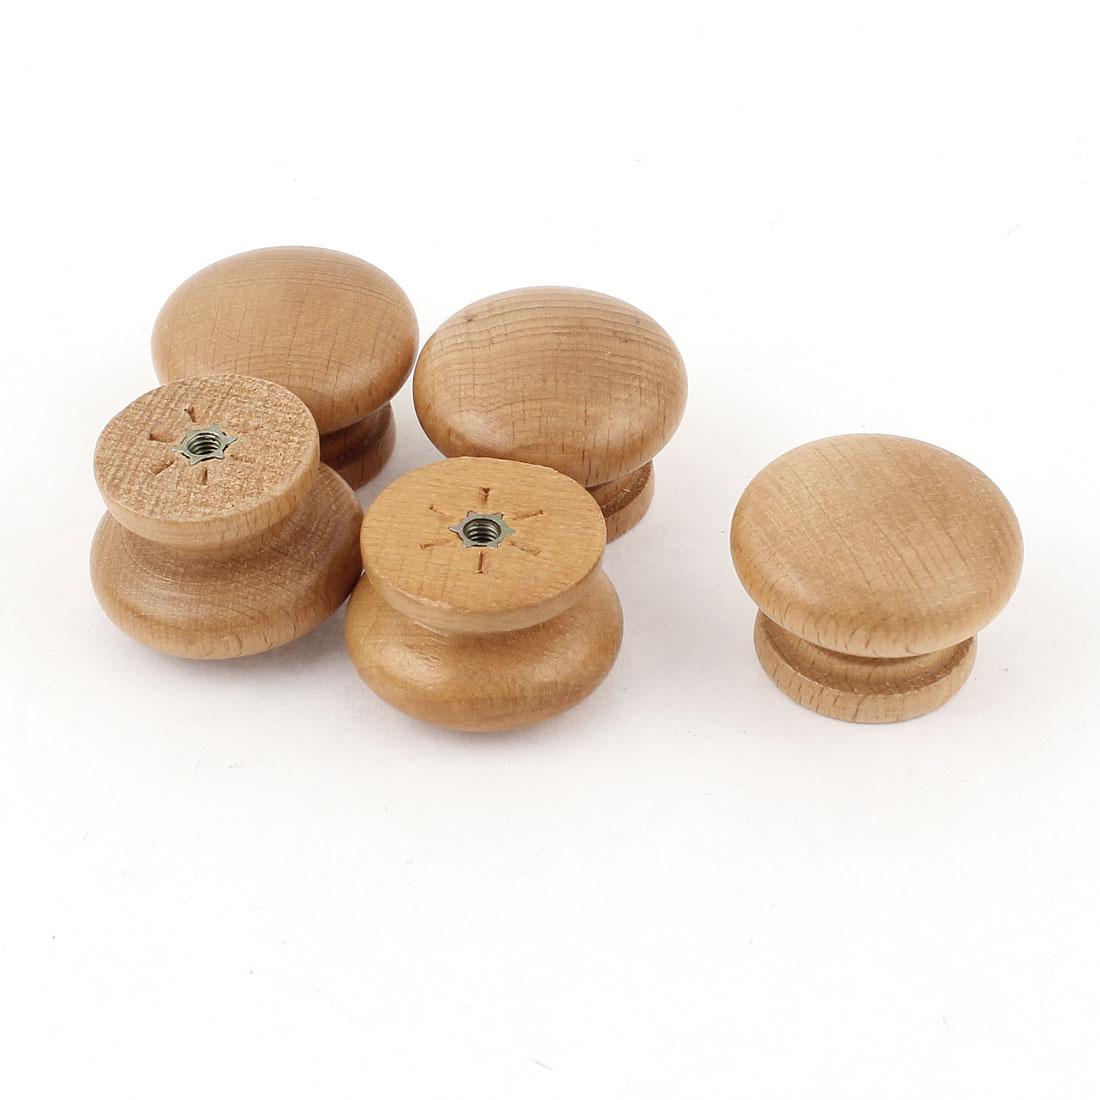 5Pcs Hardware Wooden Door Knob Wardrobe Cabinet Drawer Pull Handle